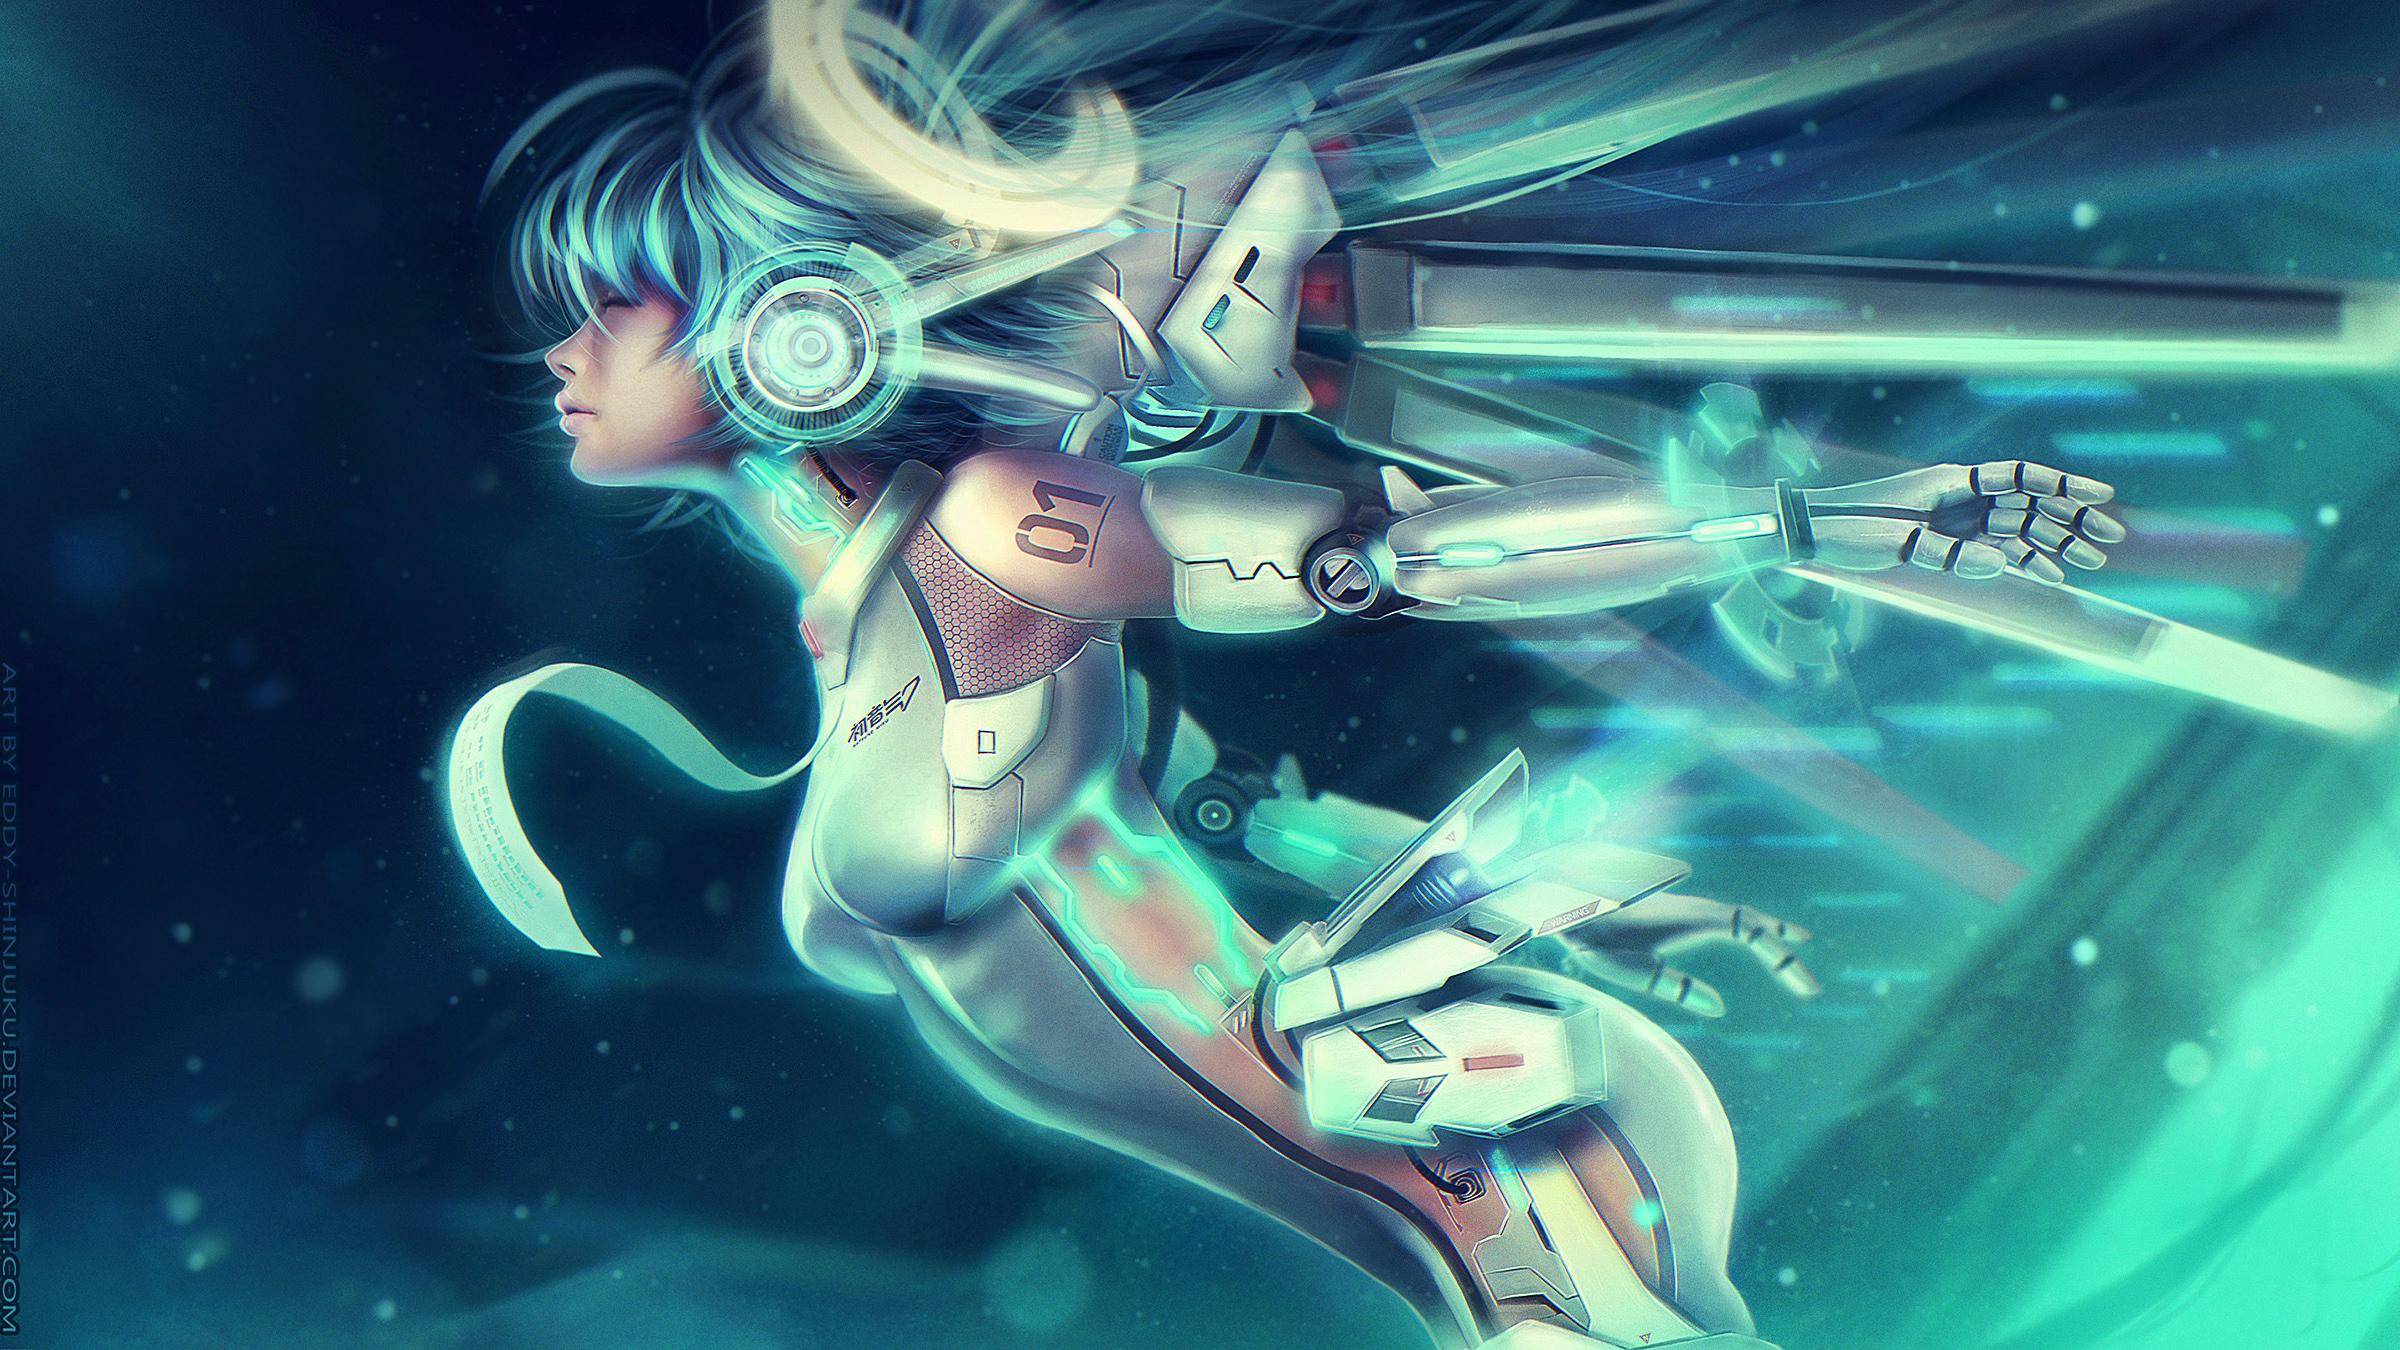 ... VOCALOID UNIT 01: Ascension Miku by Eddy-Shinjuku